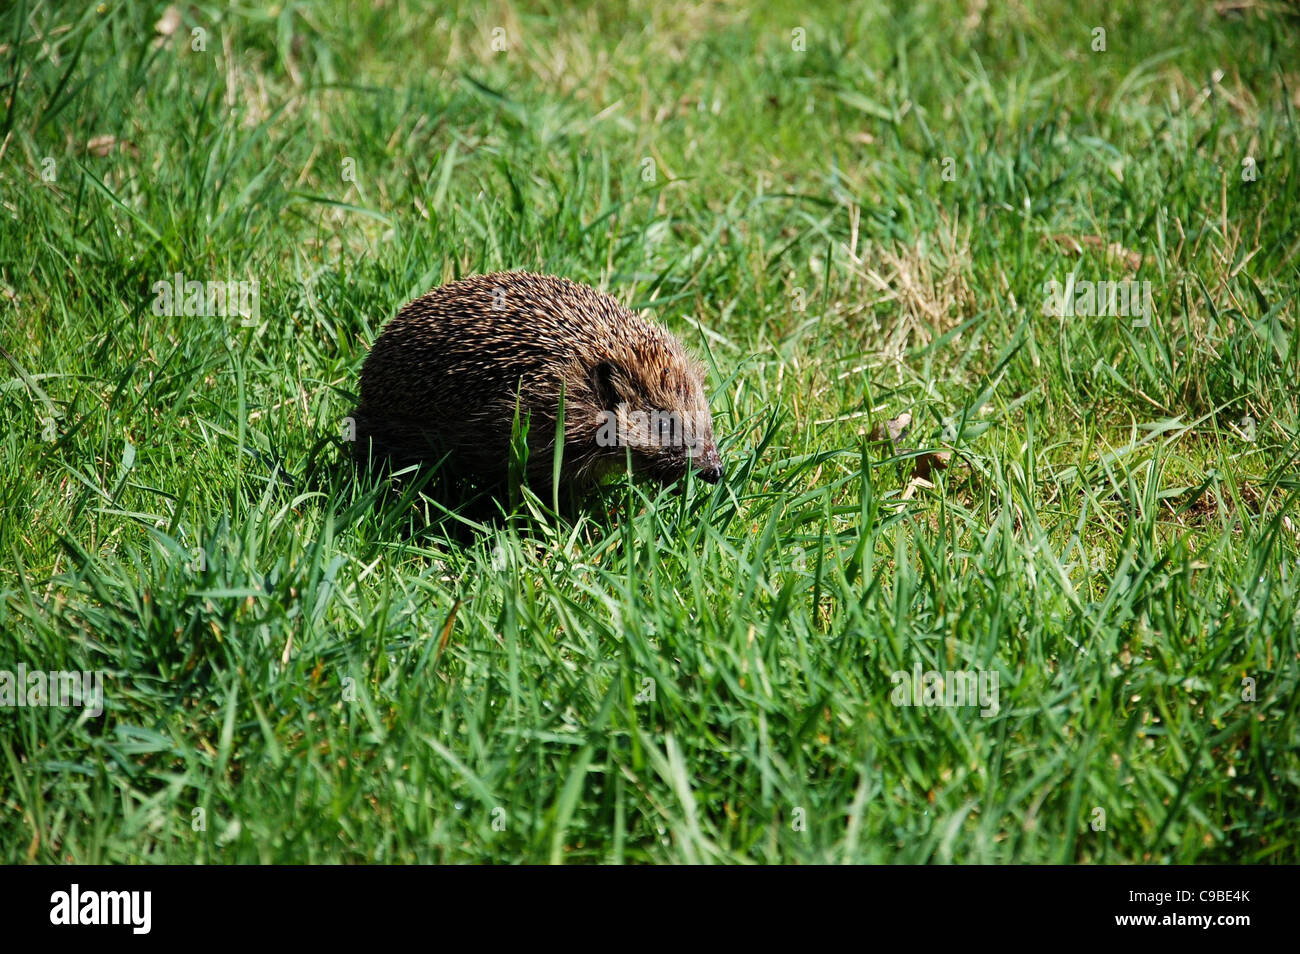 Brown hedgehog on grass - Stock Image